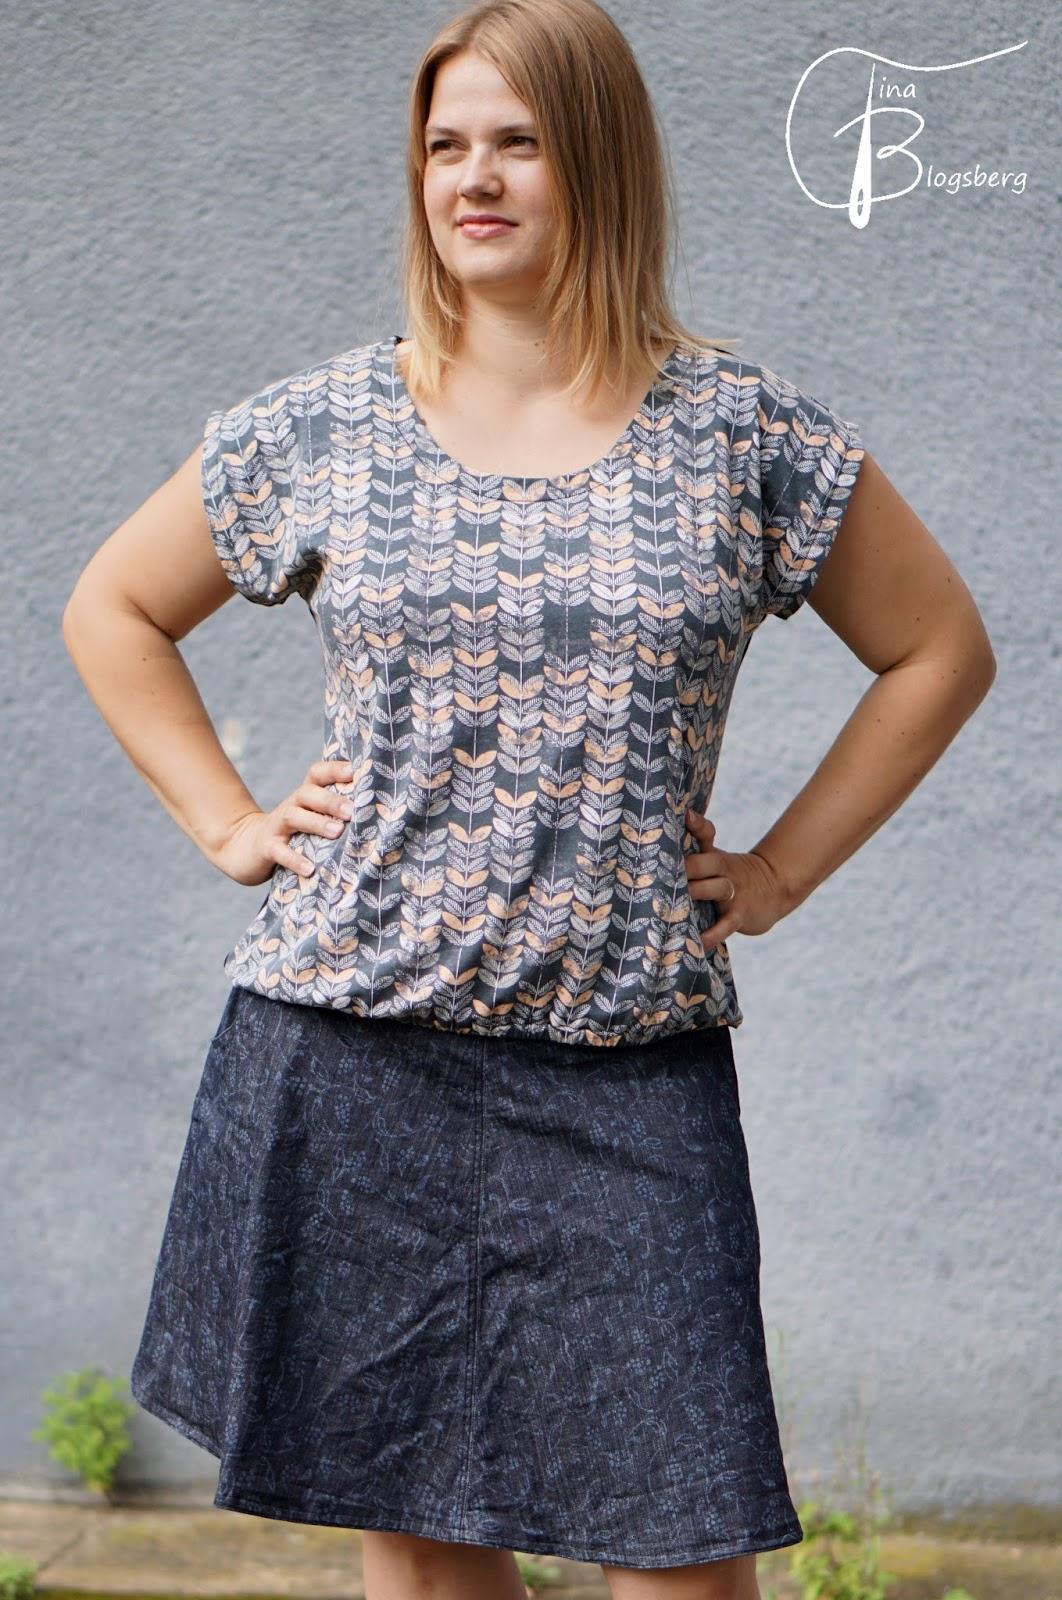 Tina Blogsberg: Alternativen zum Kirsten Kimono Tee